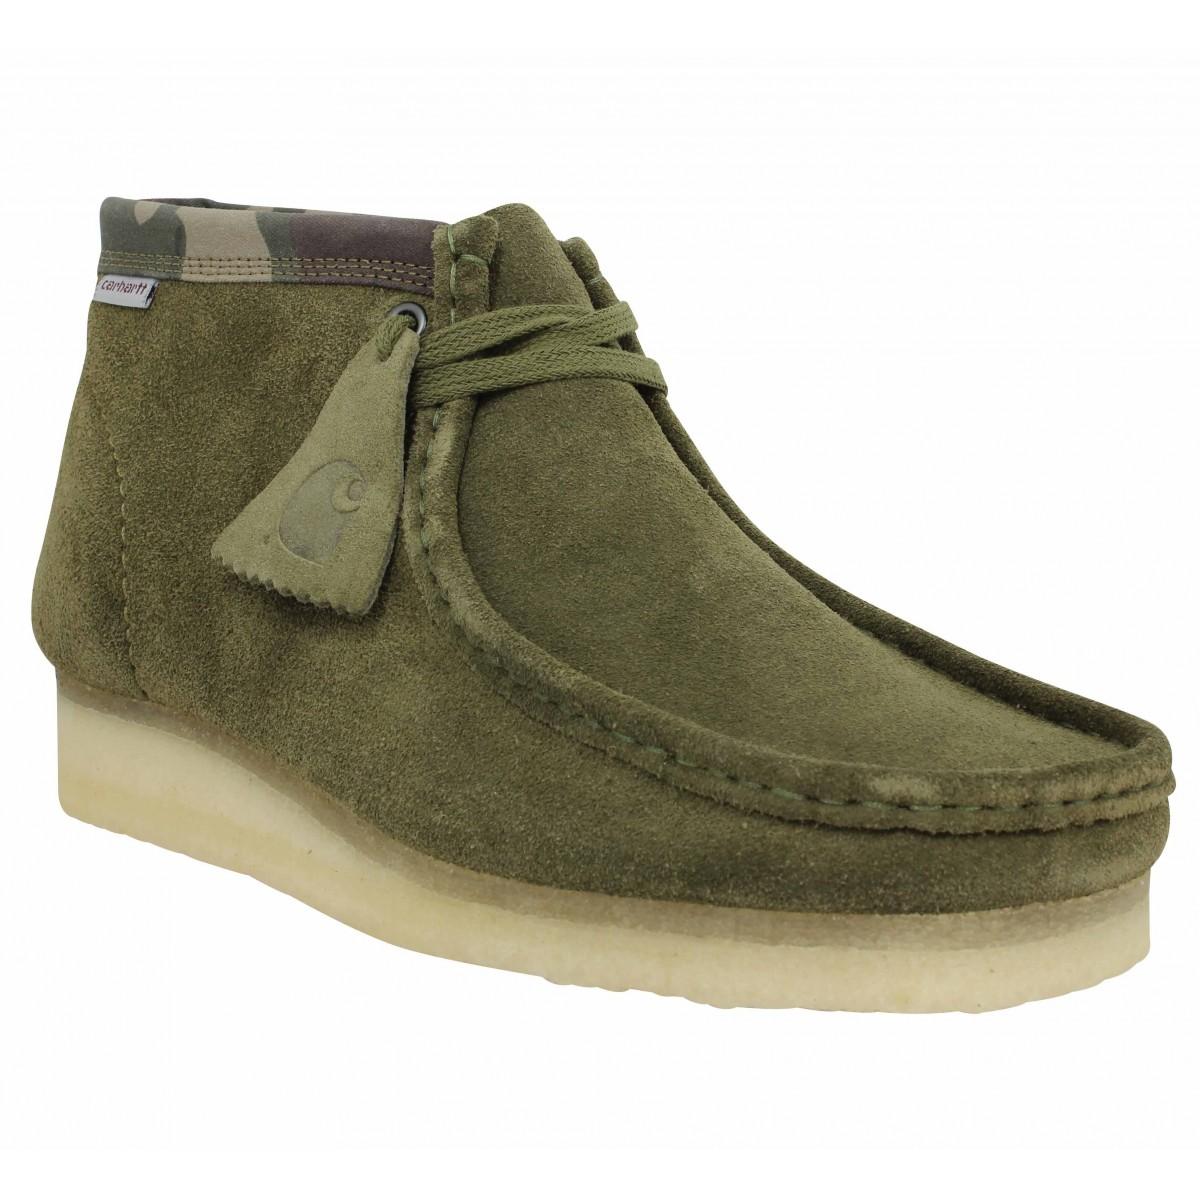 Bottines CLARKS ORIGINALS X CARHARTT Wallabee Boot velours Homme Olive